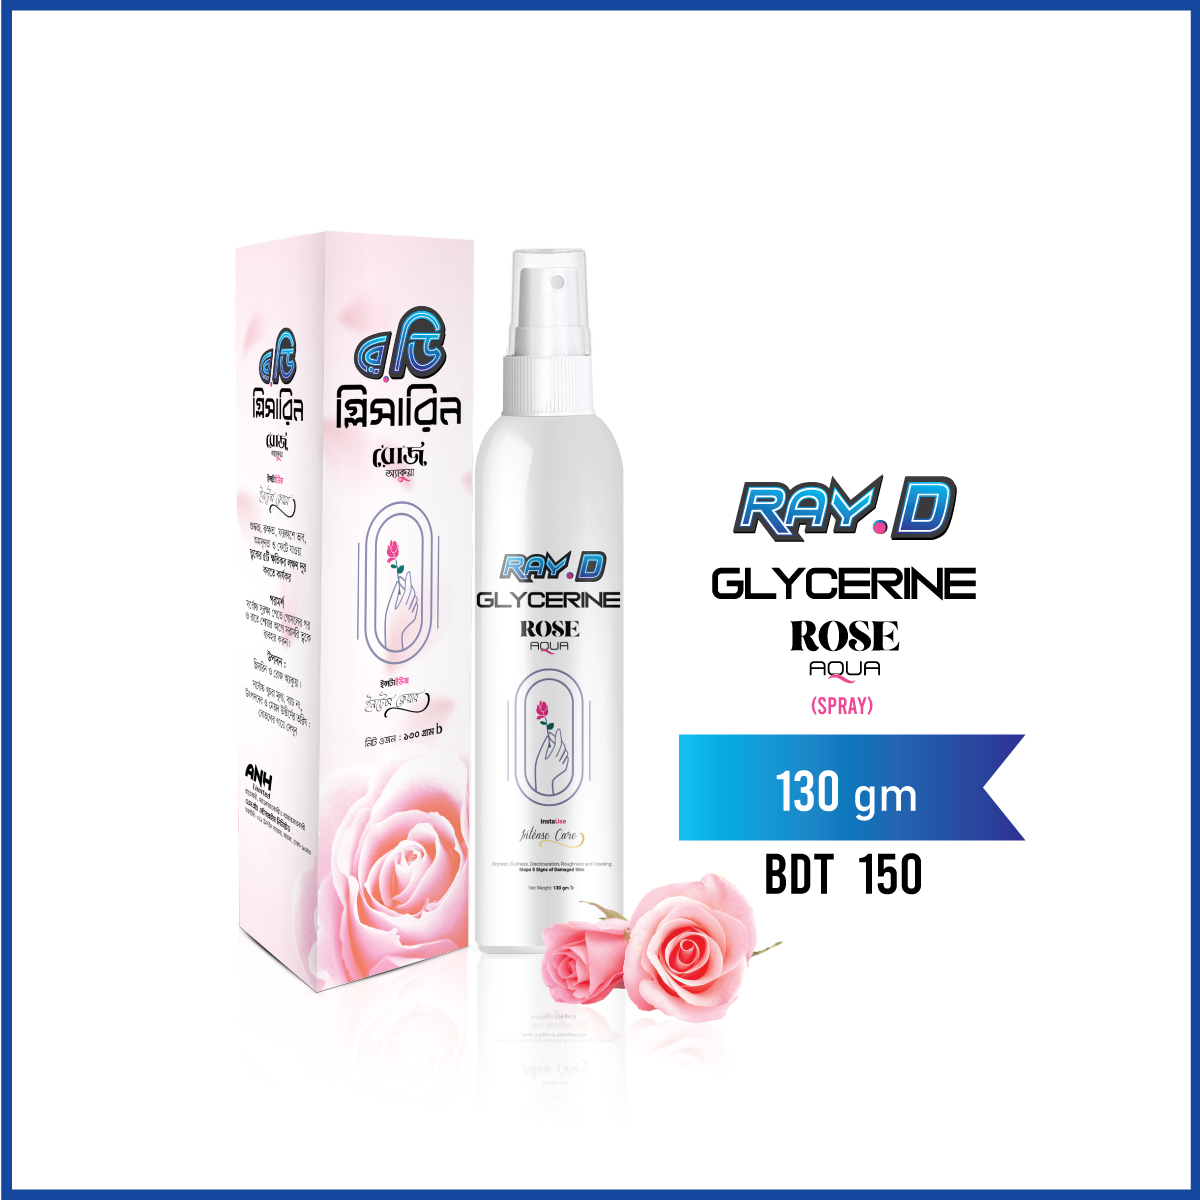 RAY.D Glycerine Rose Aqua (Spray) 130 gm